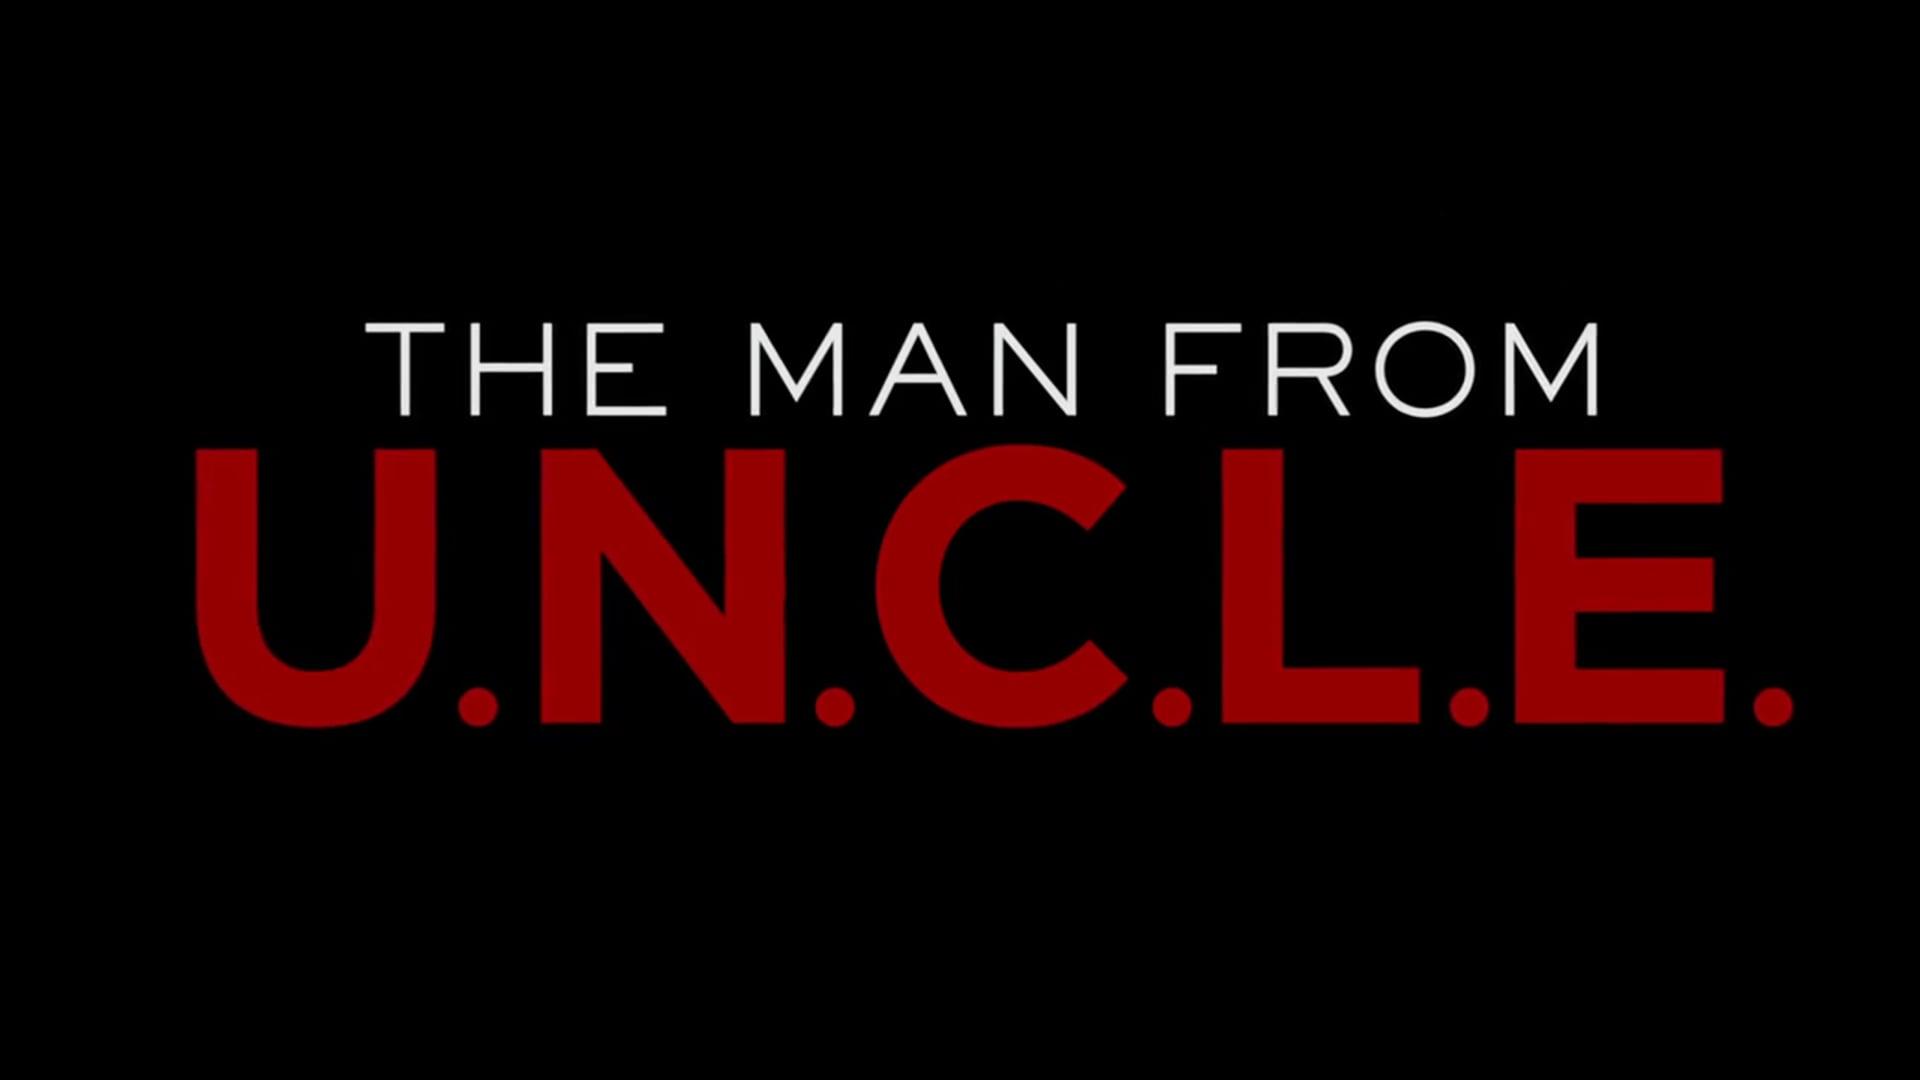 The Man From U.N.C.L.E. I Warner Brothers